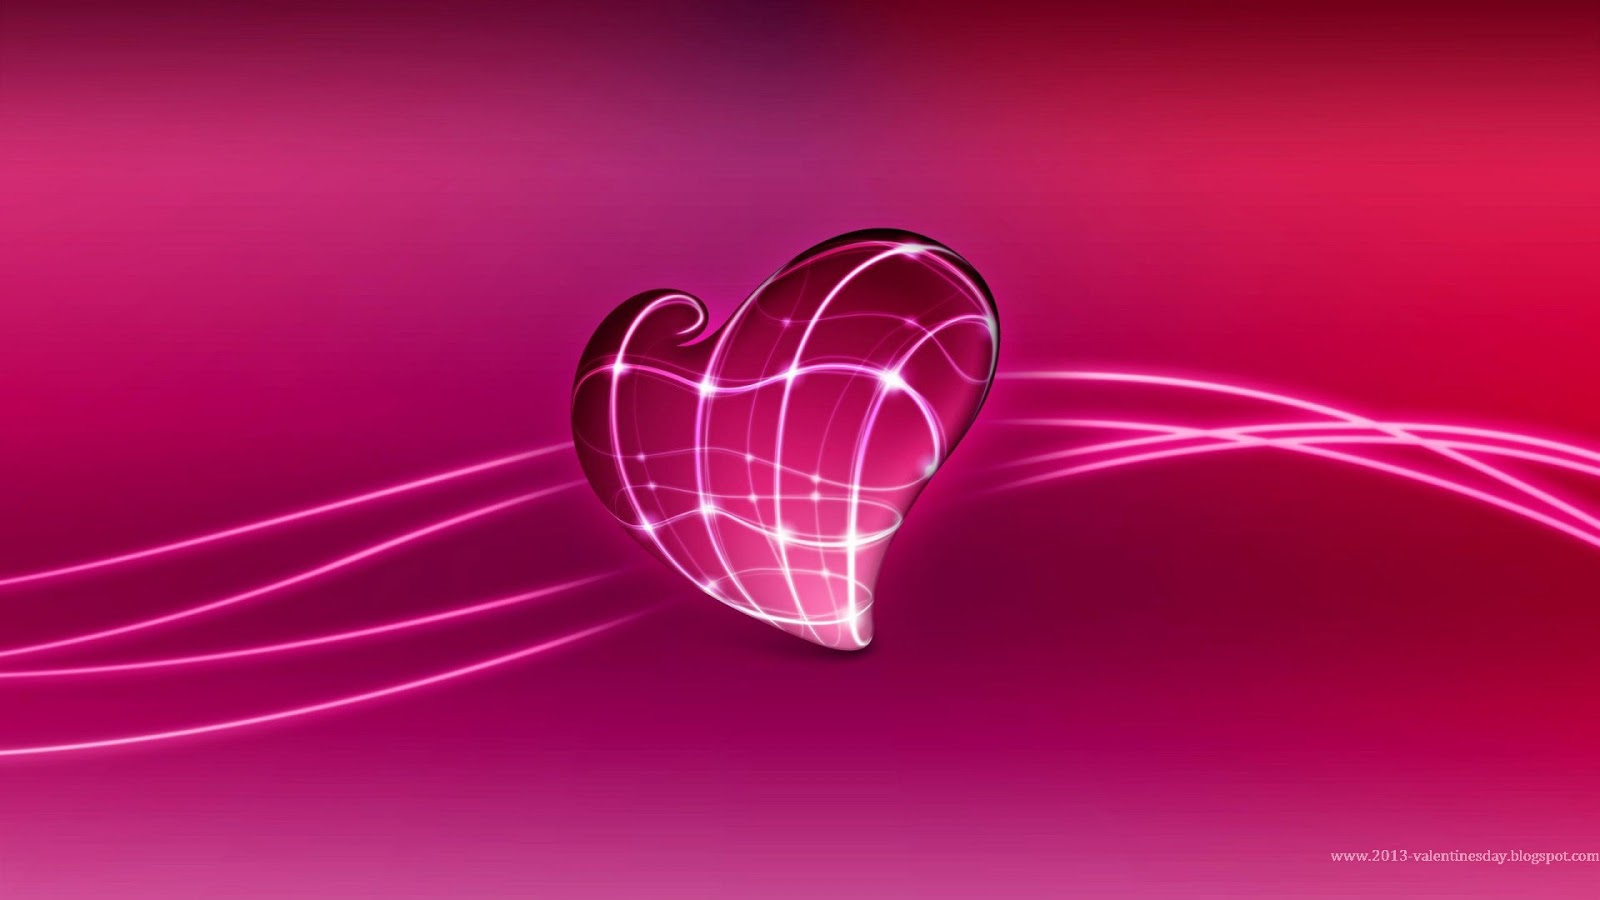 http://3.bp.blogspot.com/-AMO4OeaDM_M/UQLQYcKgcJI/AAAAAAAAC9Q/AueimqNoqXM/s1600/pink_love_heart_wallpaper_1920x1080.jpg